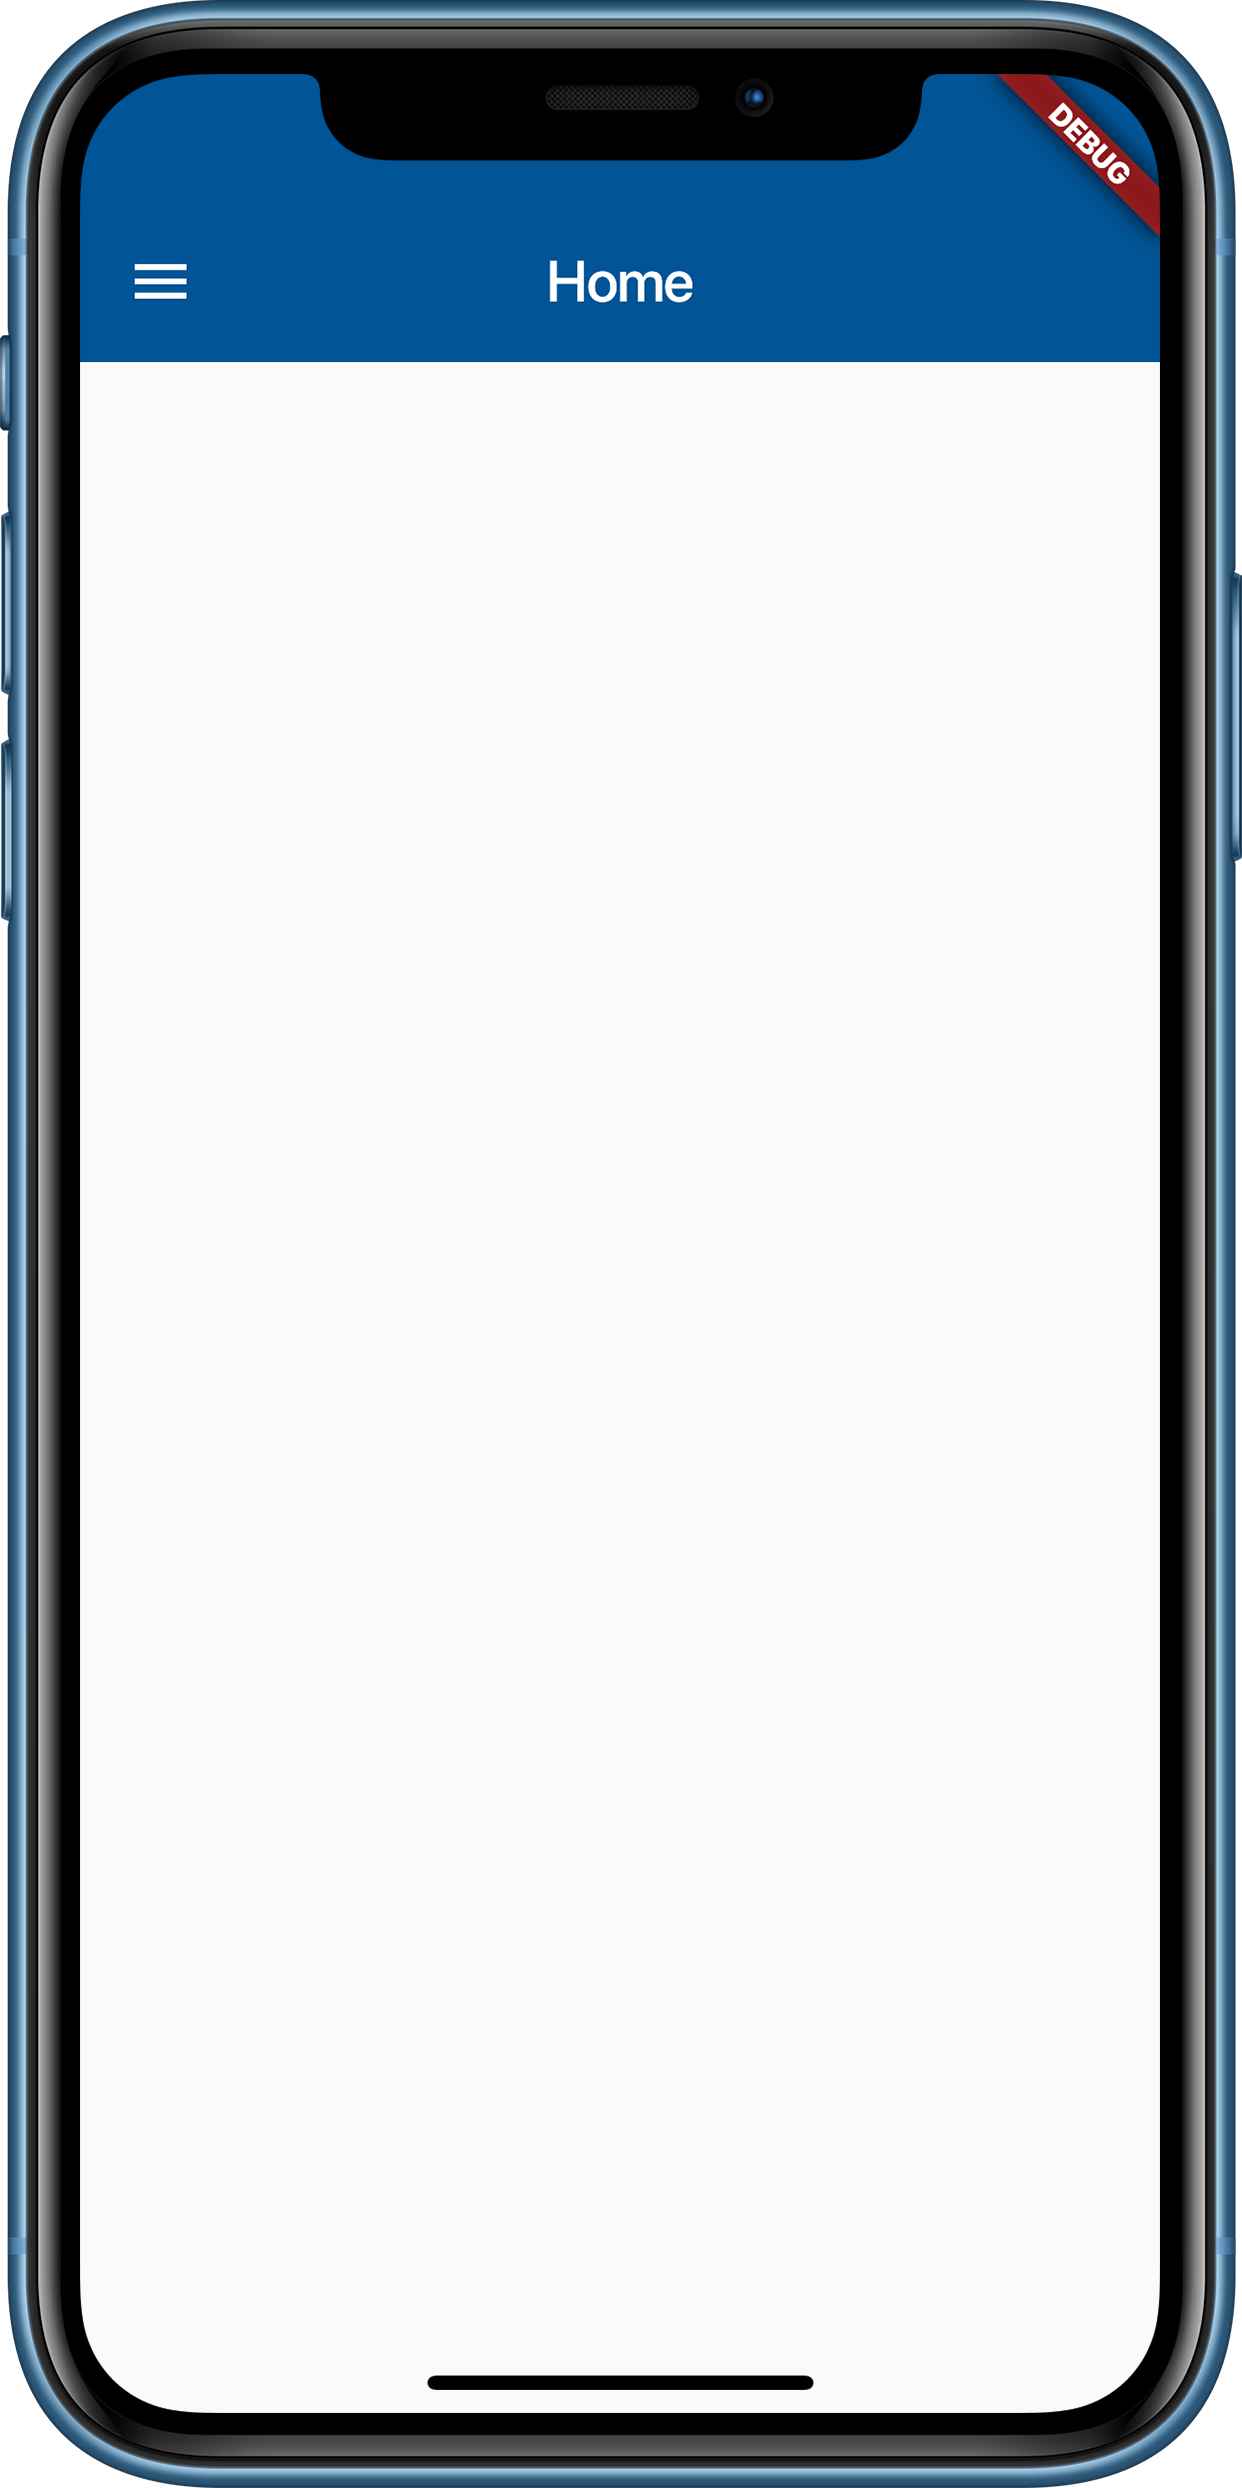 Flutter UI Component - Build App Using Material Design UI